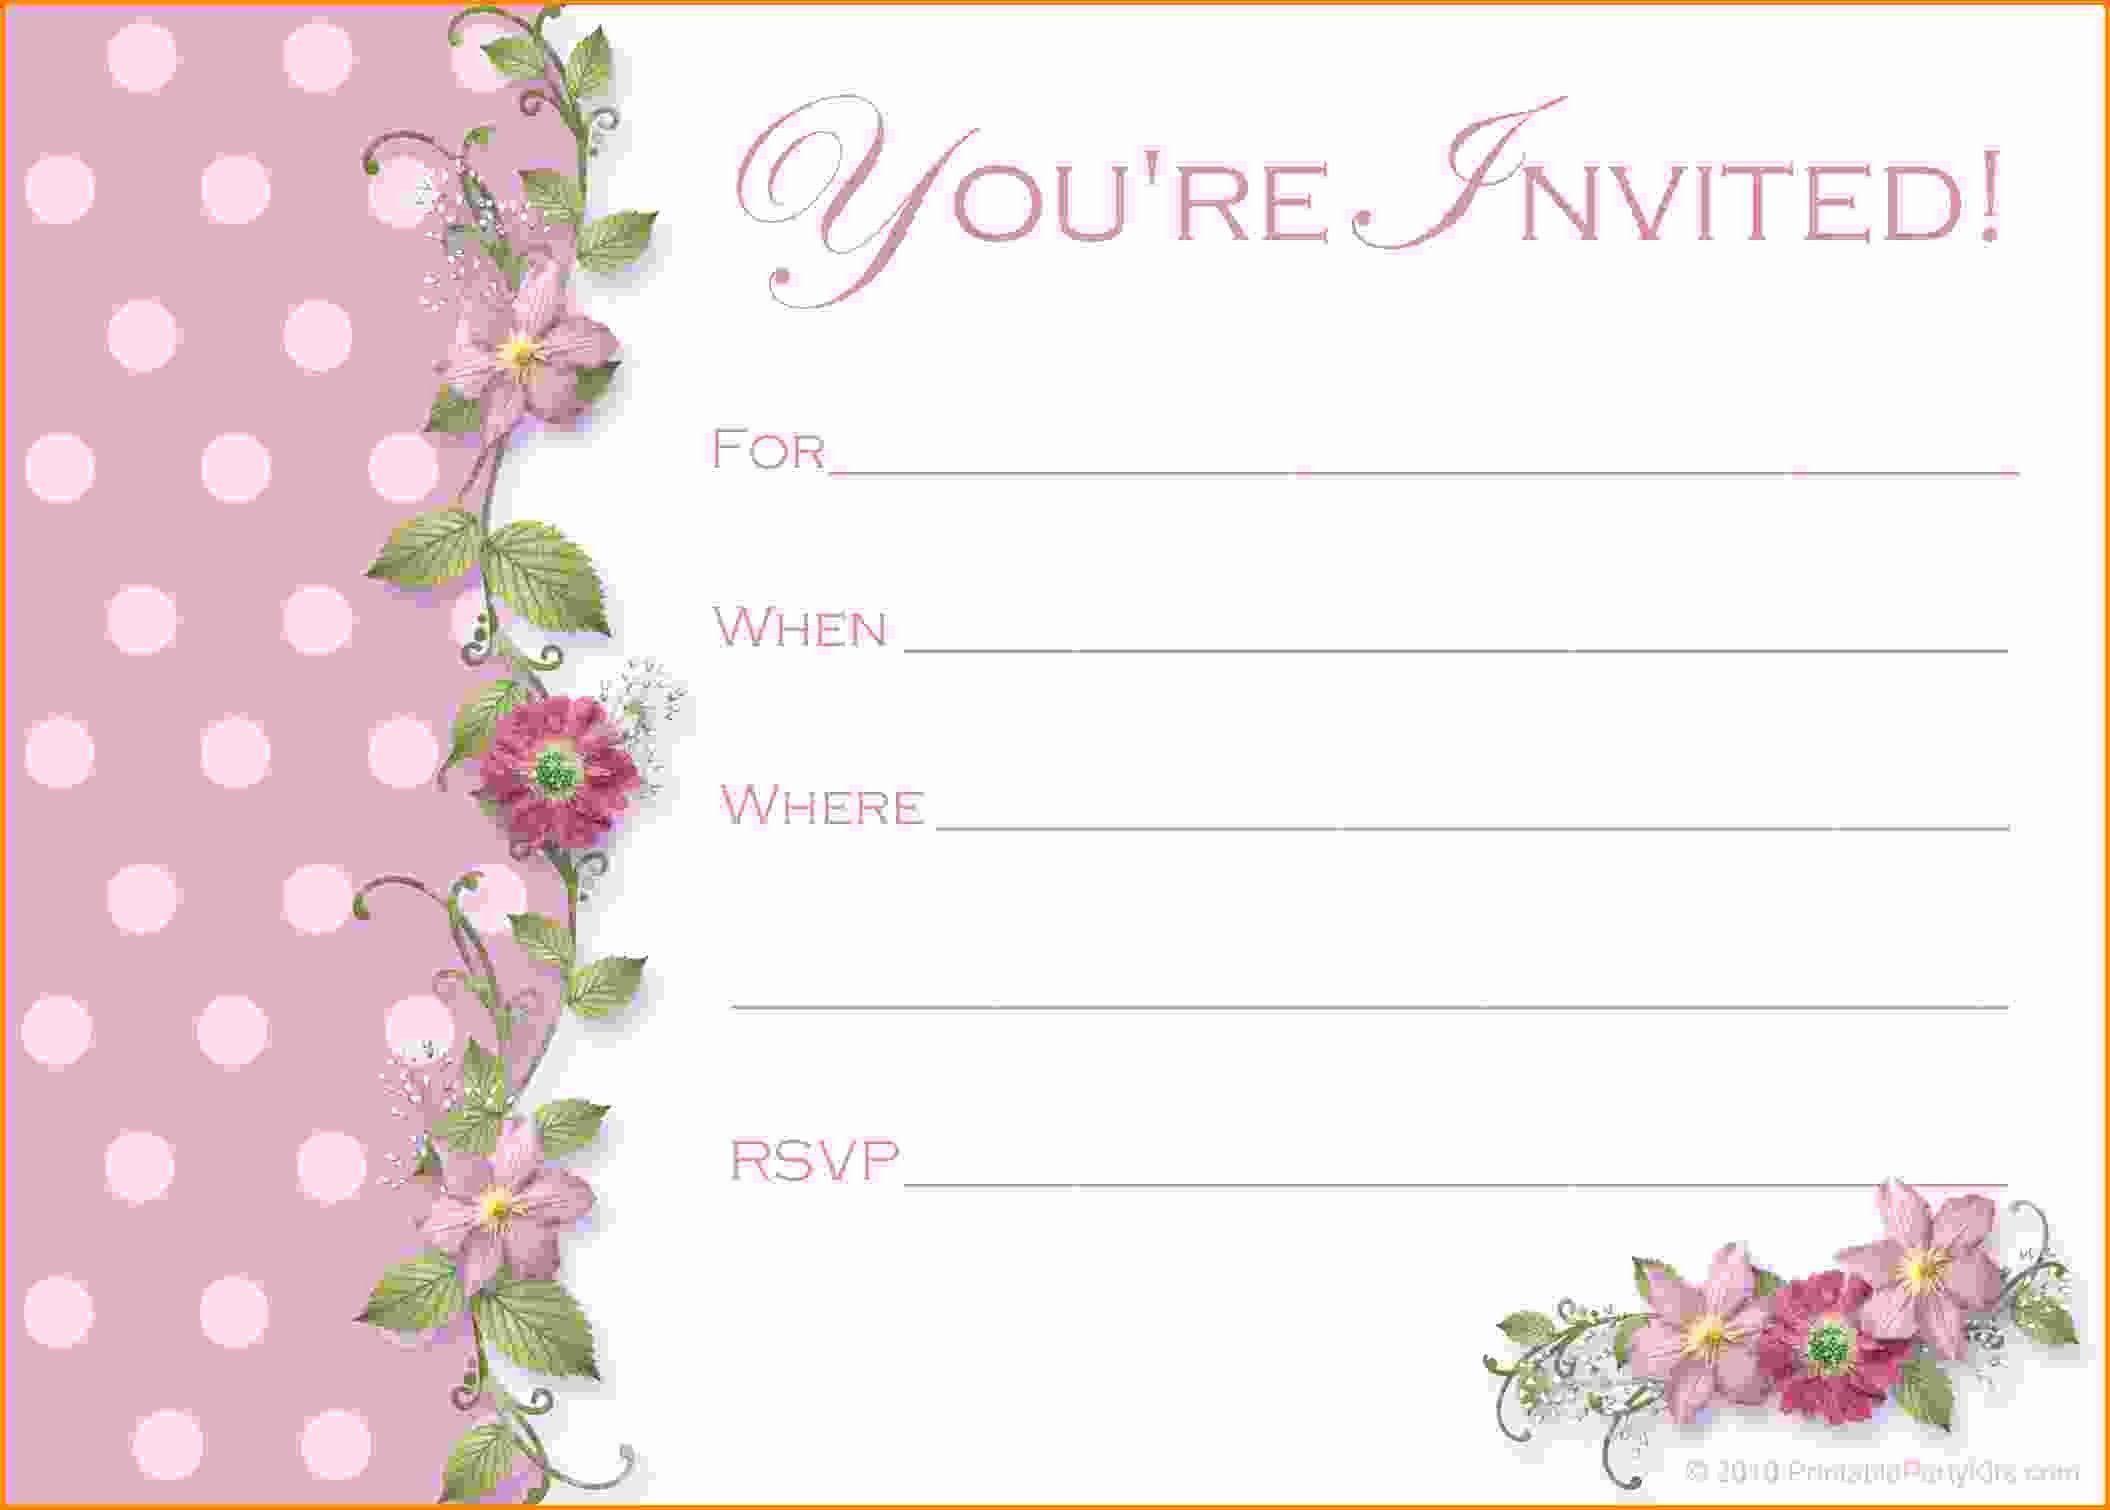 000 Stupendou Birthday Invitation Template Word 2020 Concept Full